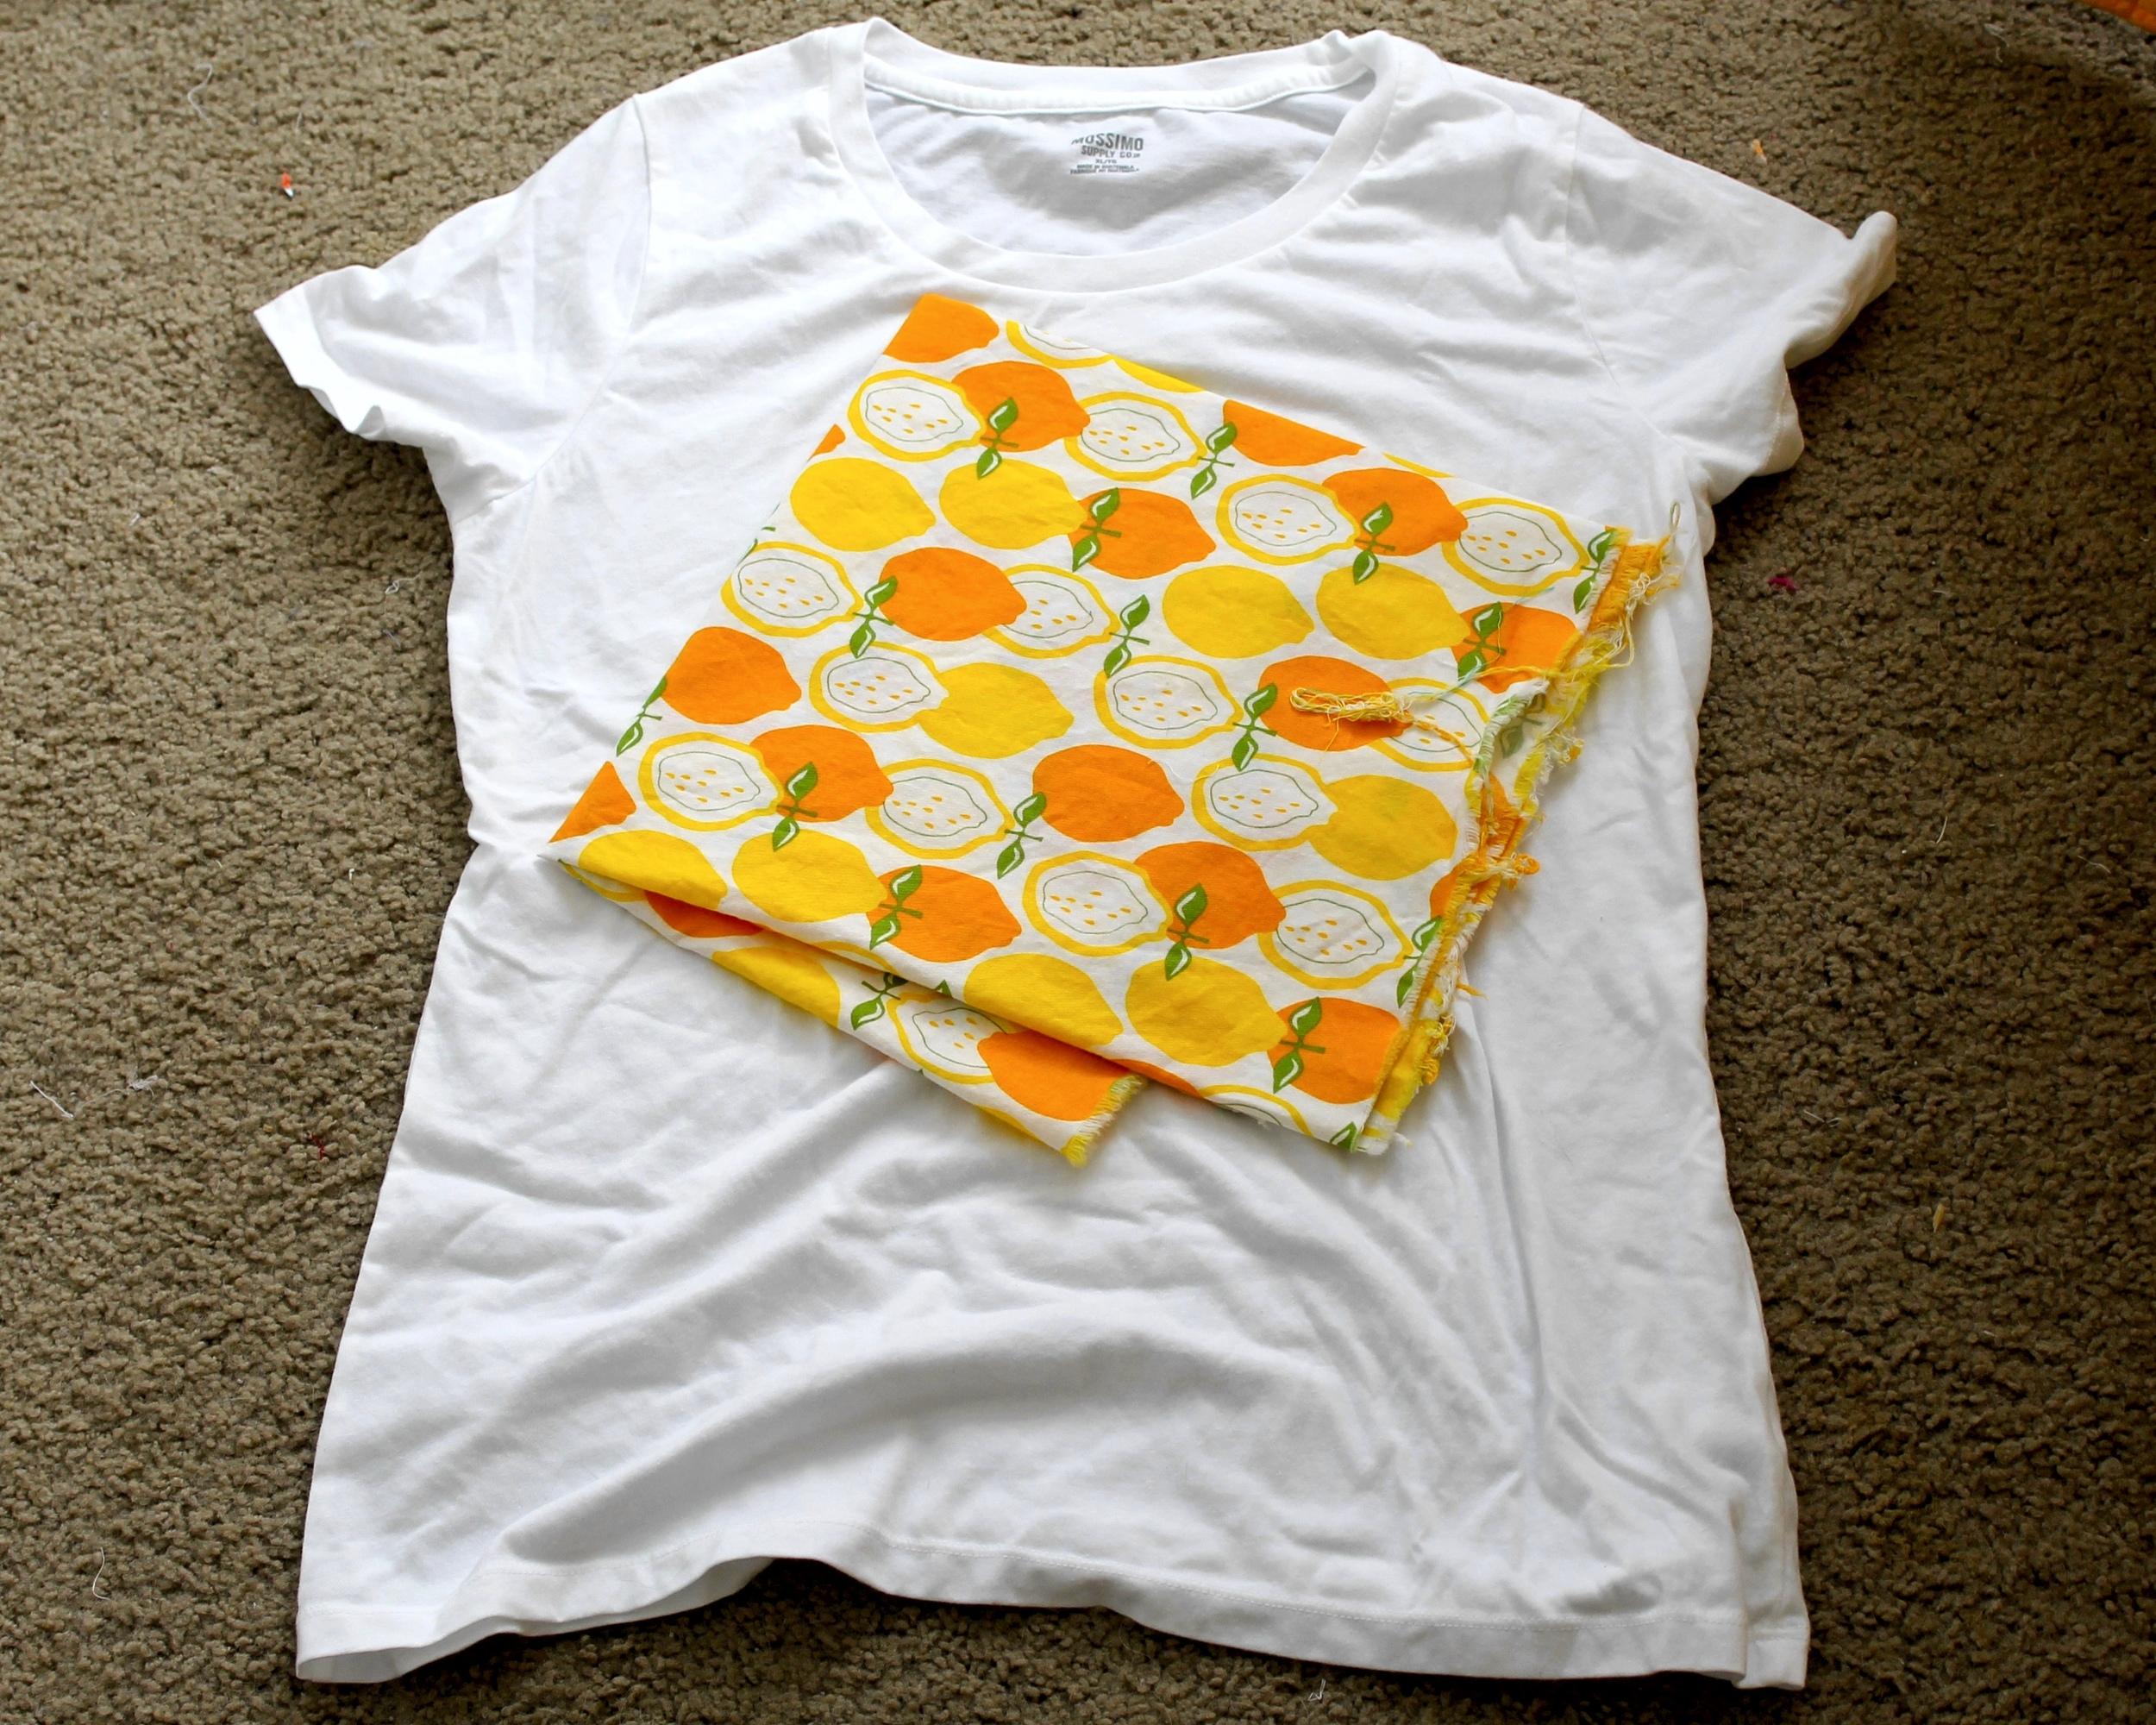 White t-shirt and lemon fabric